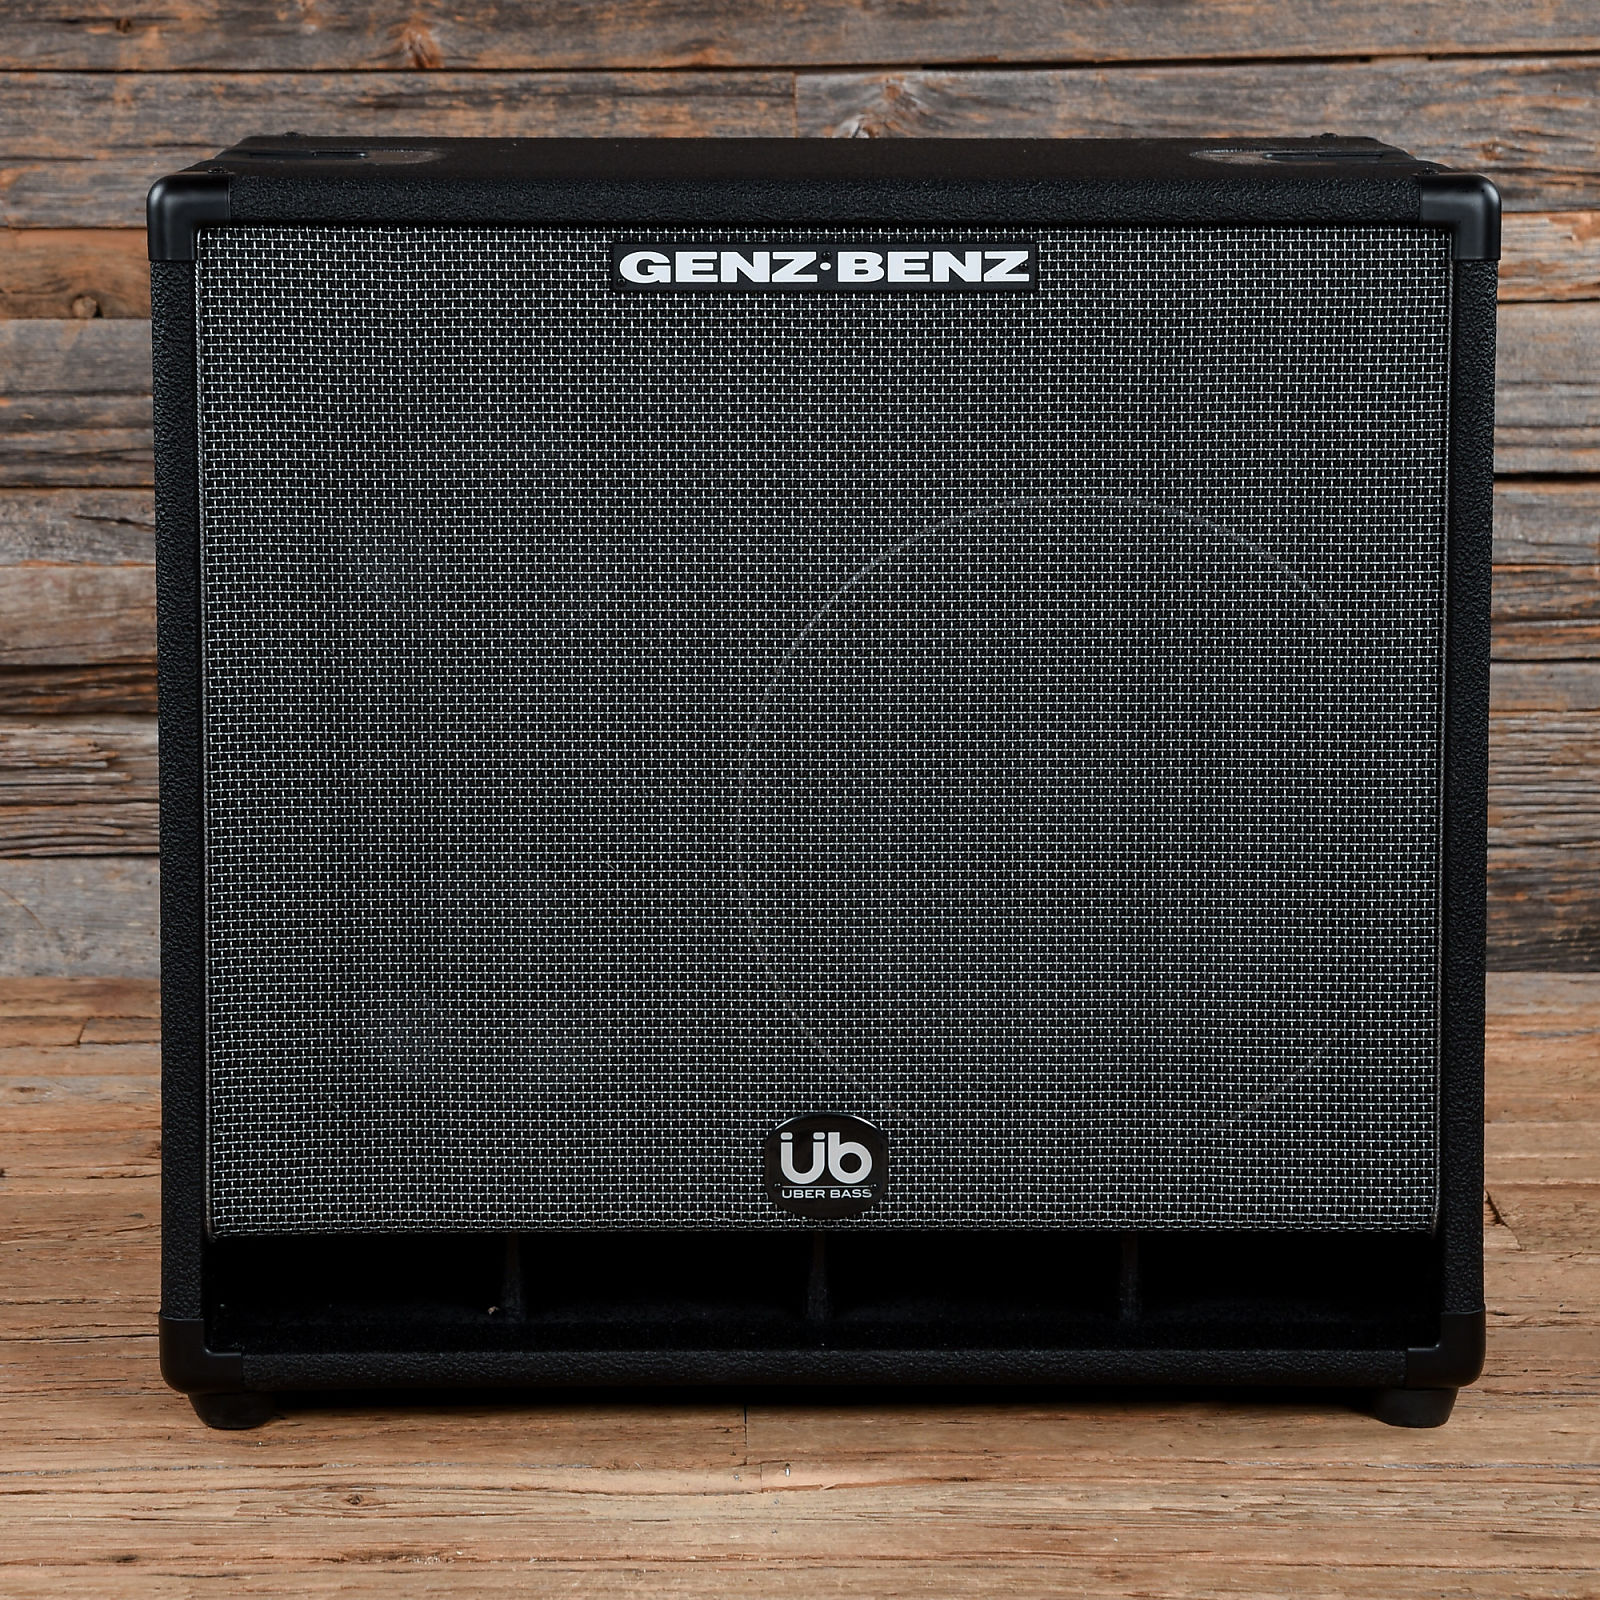 Genz Benz Uber Quad Gb 1288t Uq Bass Cabinet Used S672